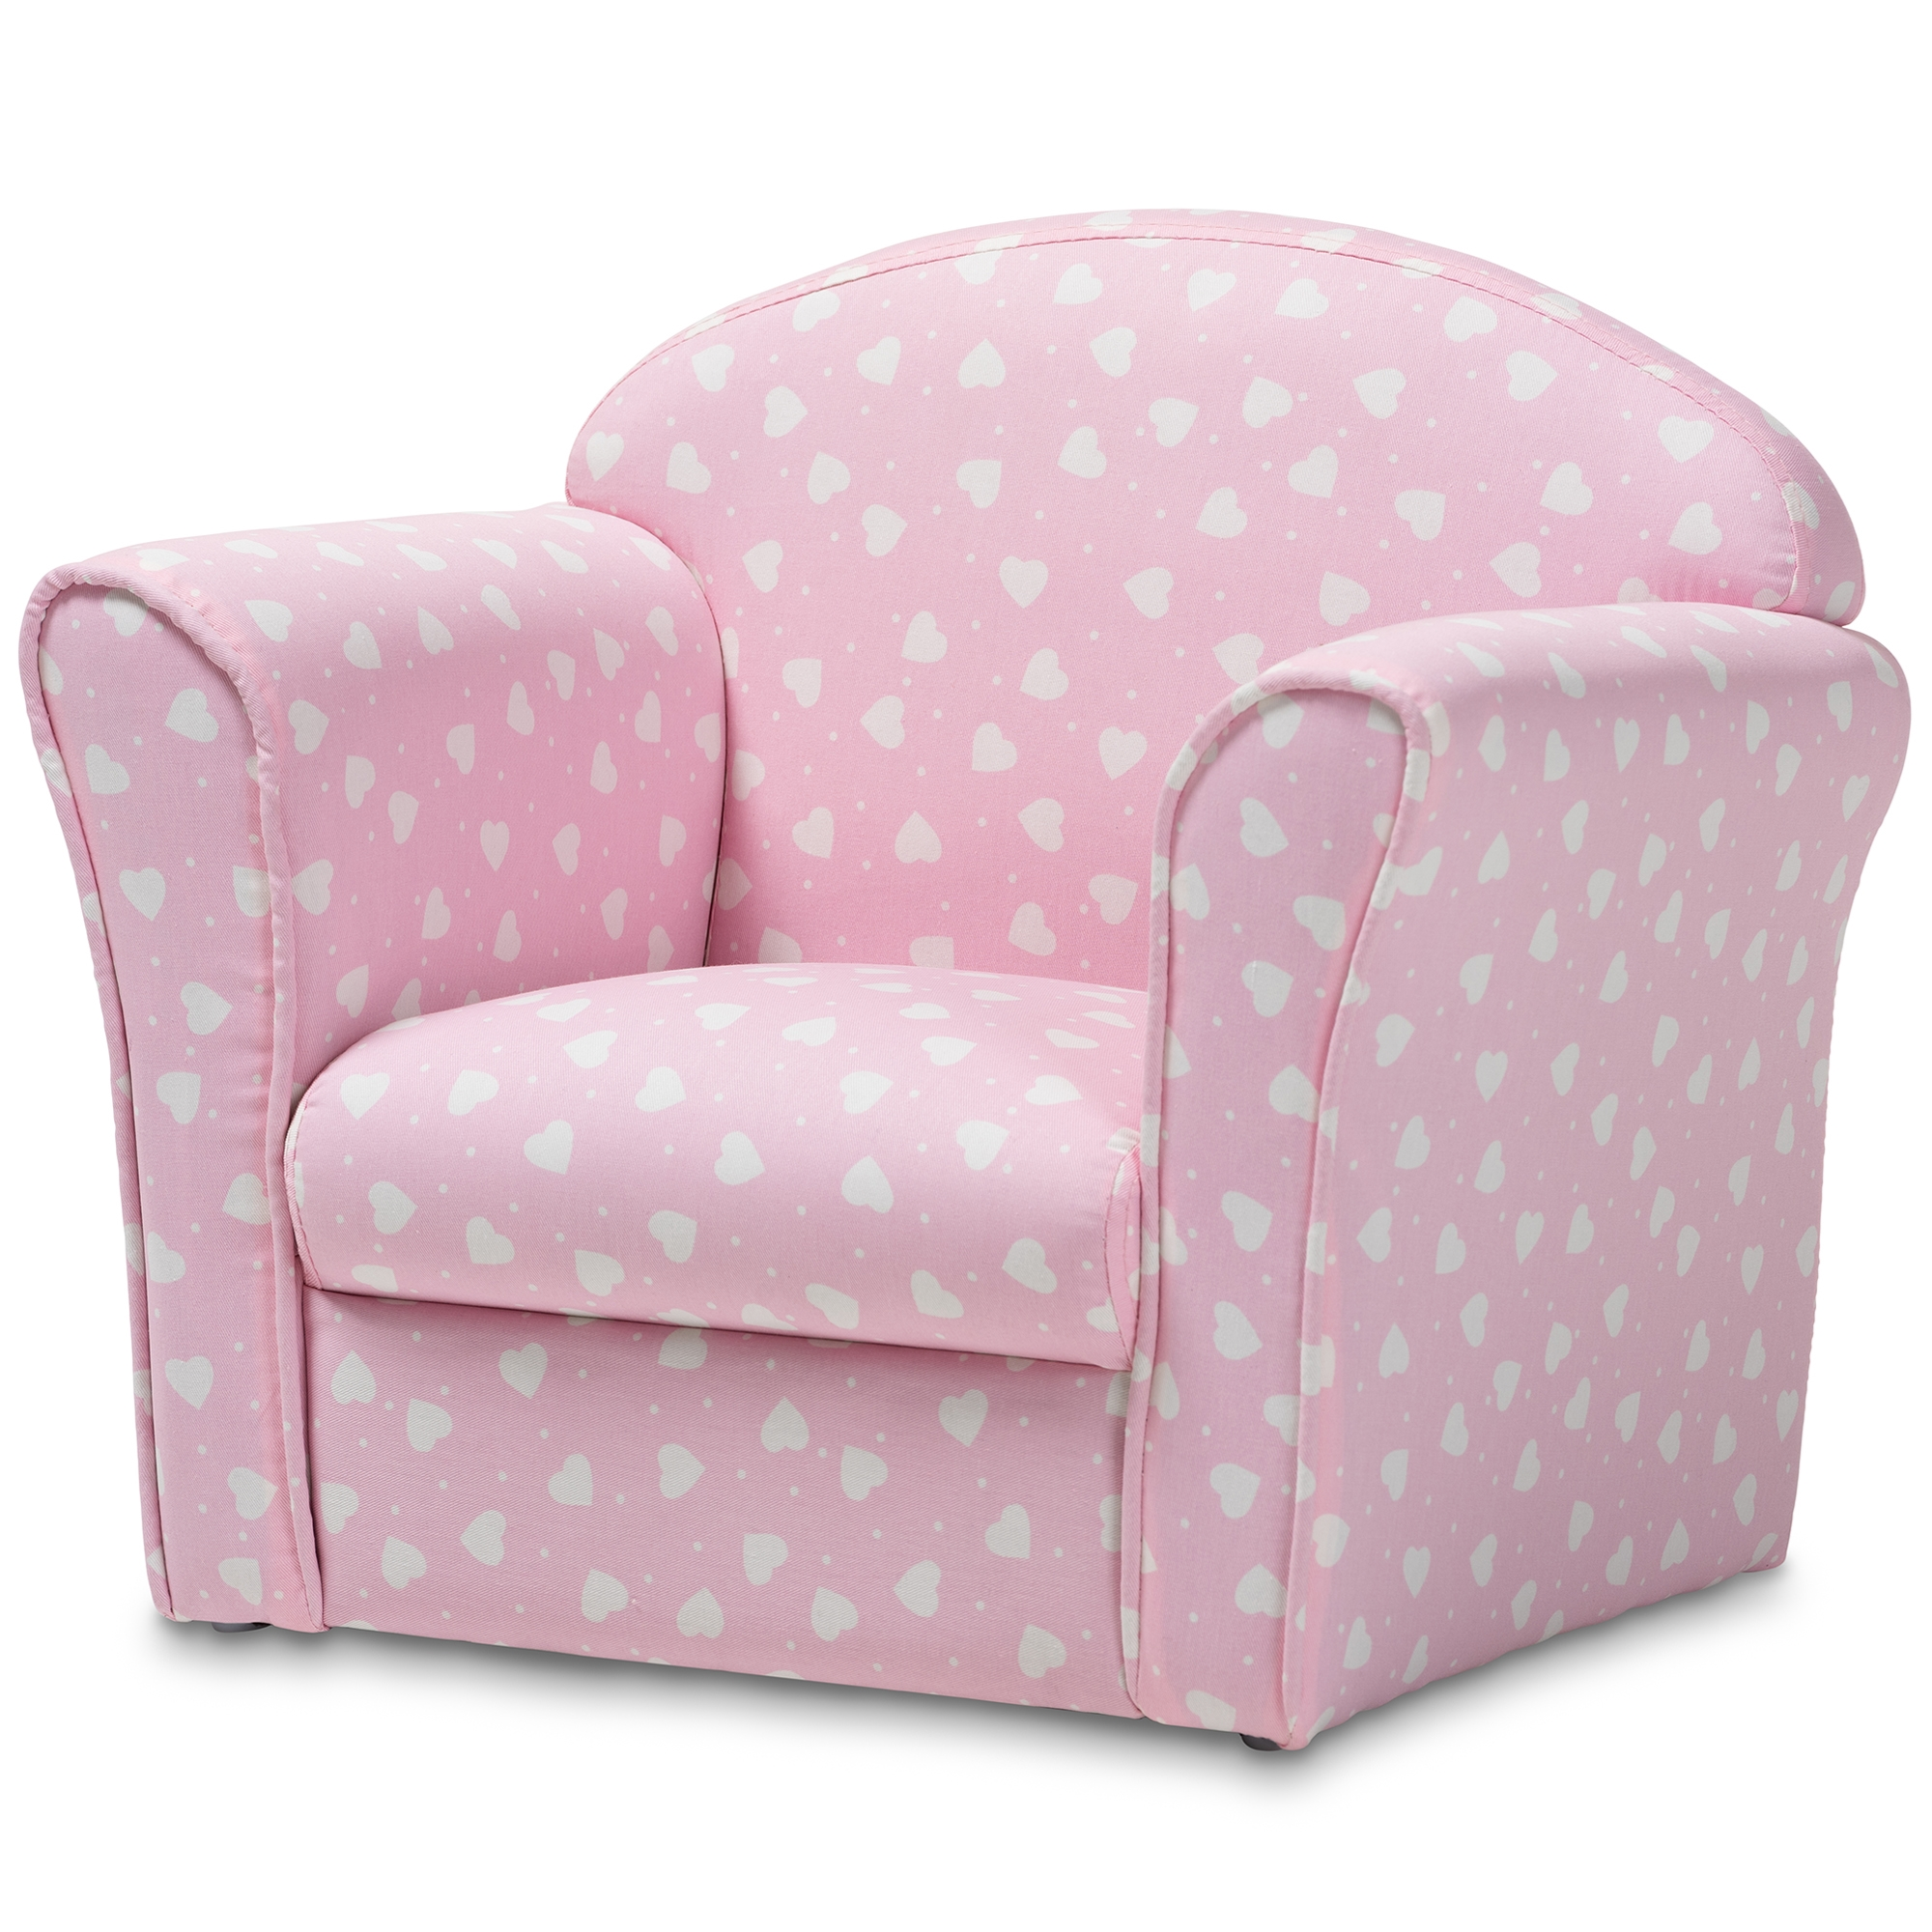 Sensational Baxton Studio Erica Modern And Contemporary Pink And White Creativecarmelina Interior Chair Design Creativecarmelinacom